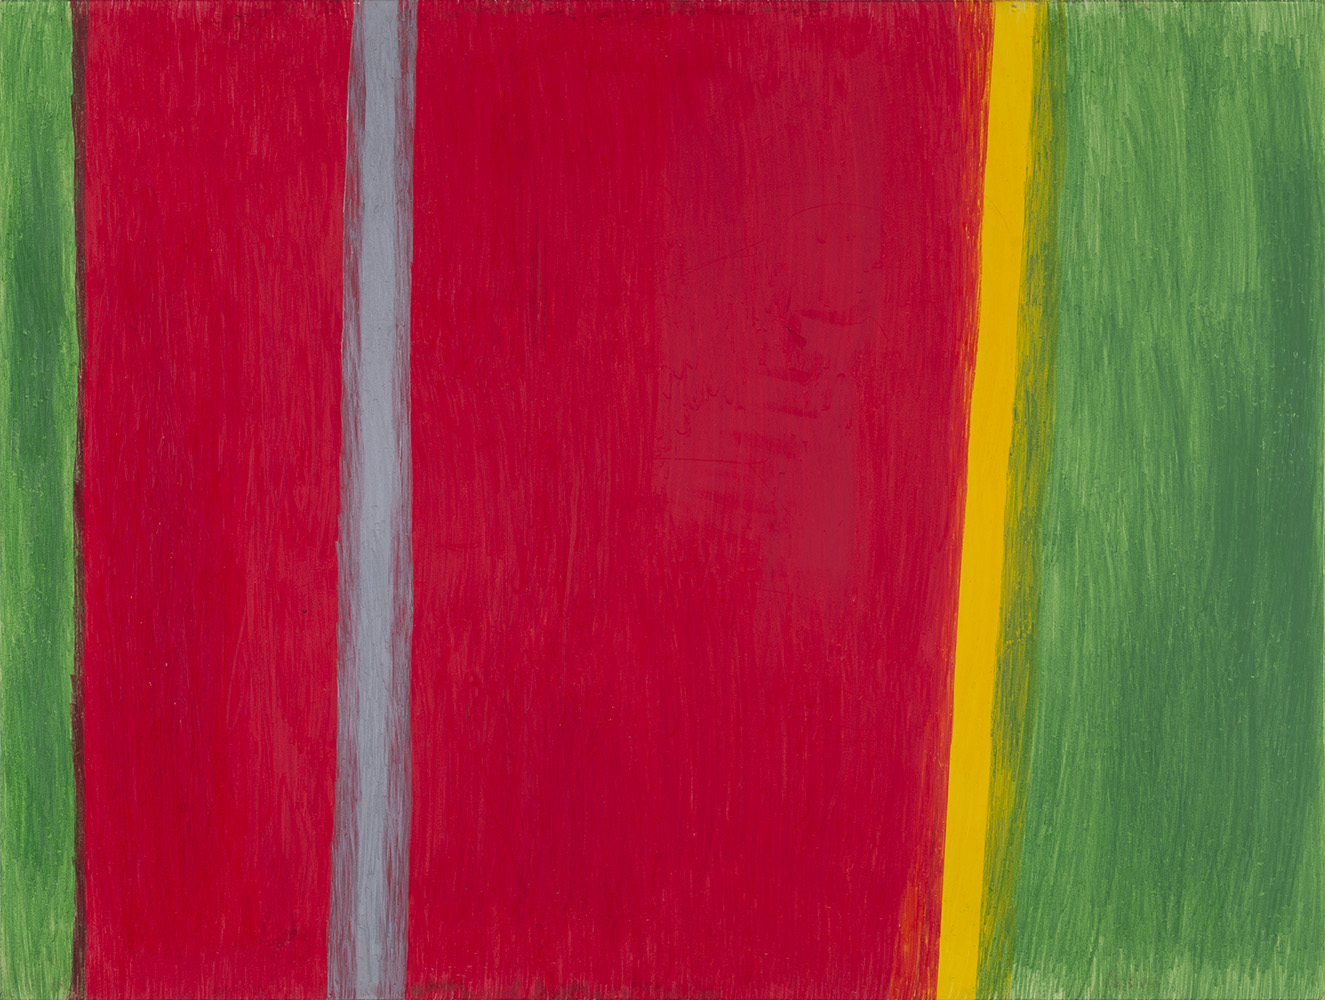 Hidetaka Kaji    Red, green, grey and yellow  , 2014 Colored pencil, paper, wooden panel 18 x 24 inches 45.7 x 61 cm HKaj 5